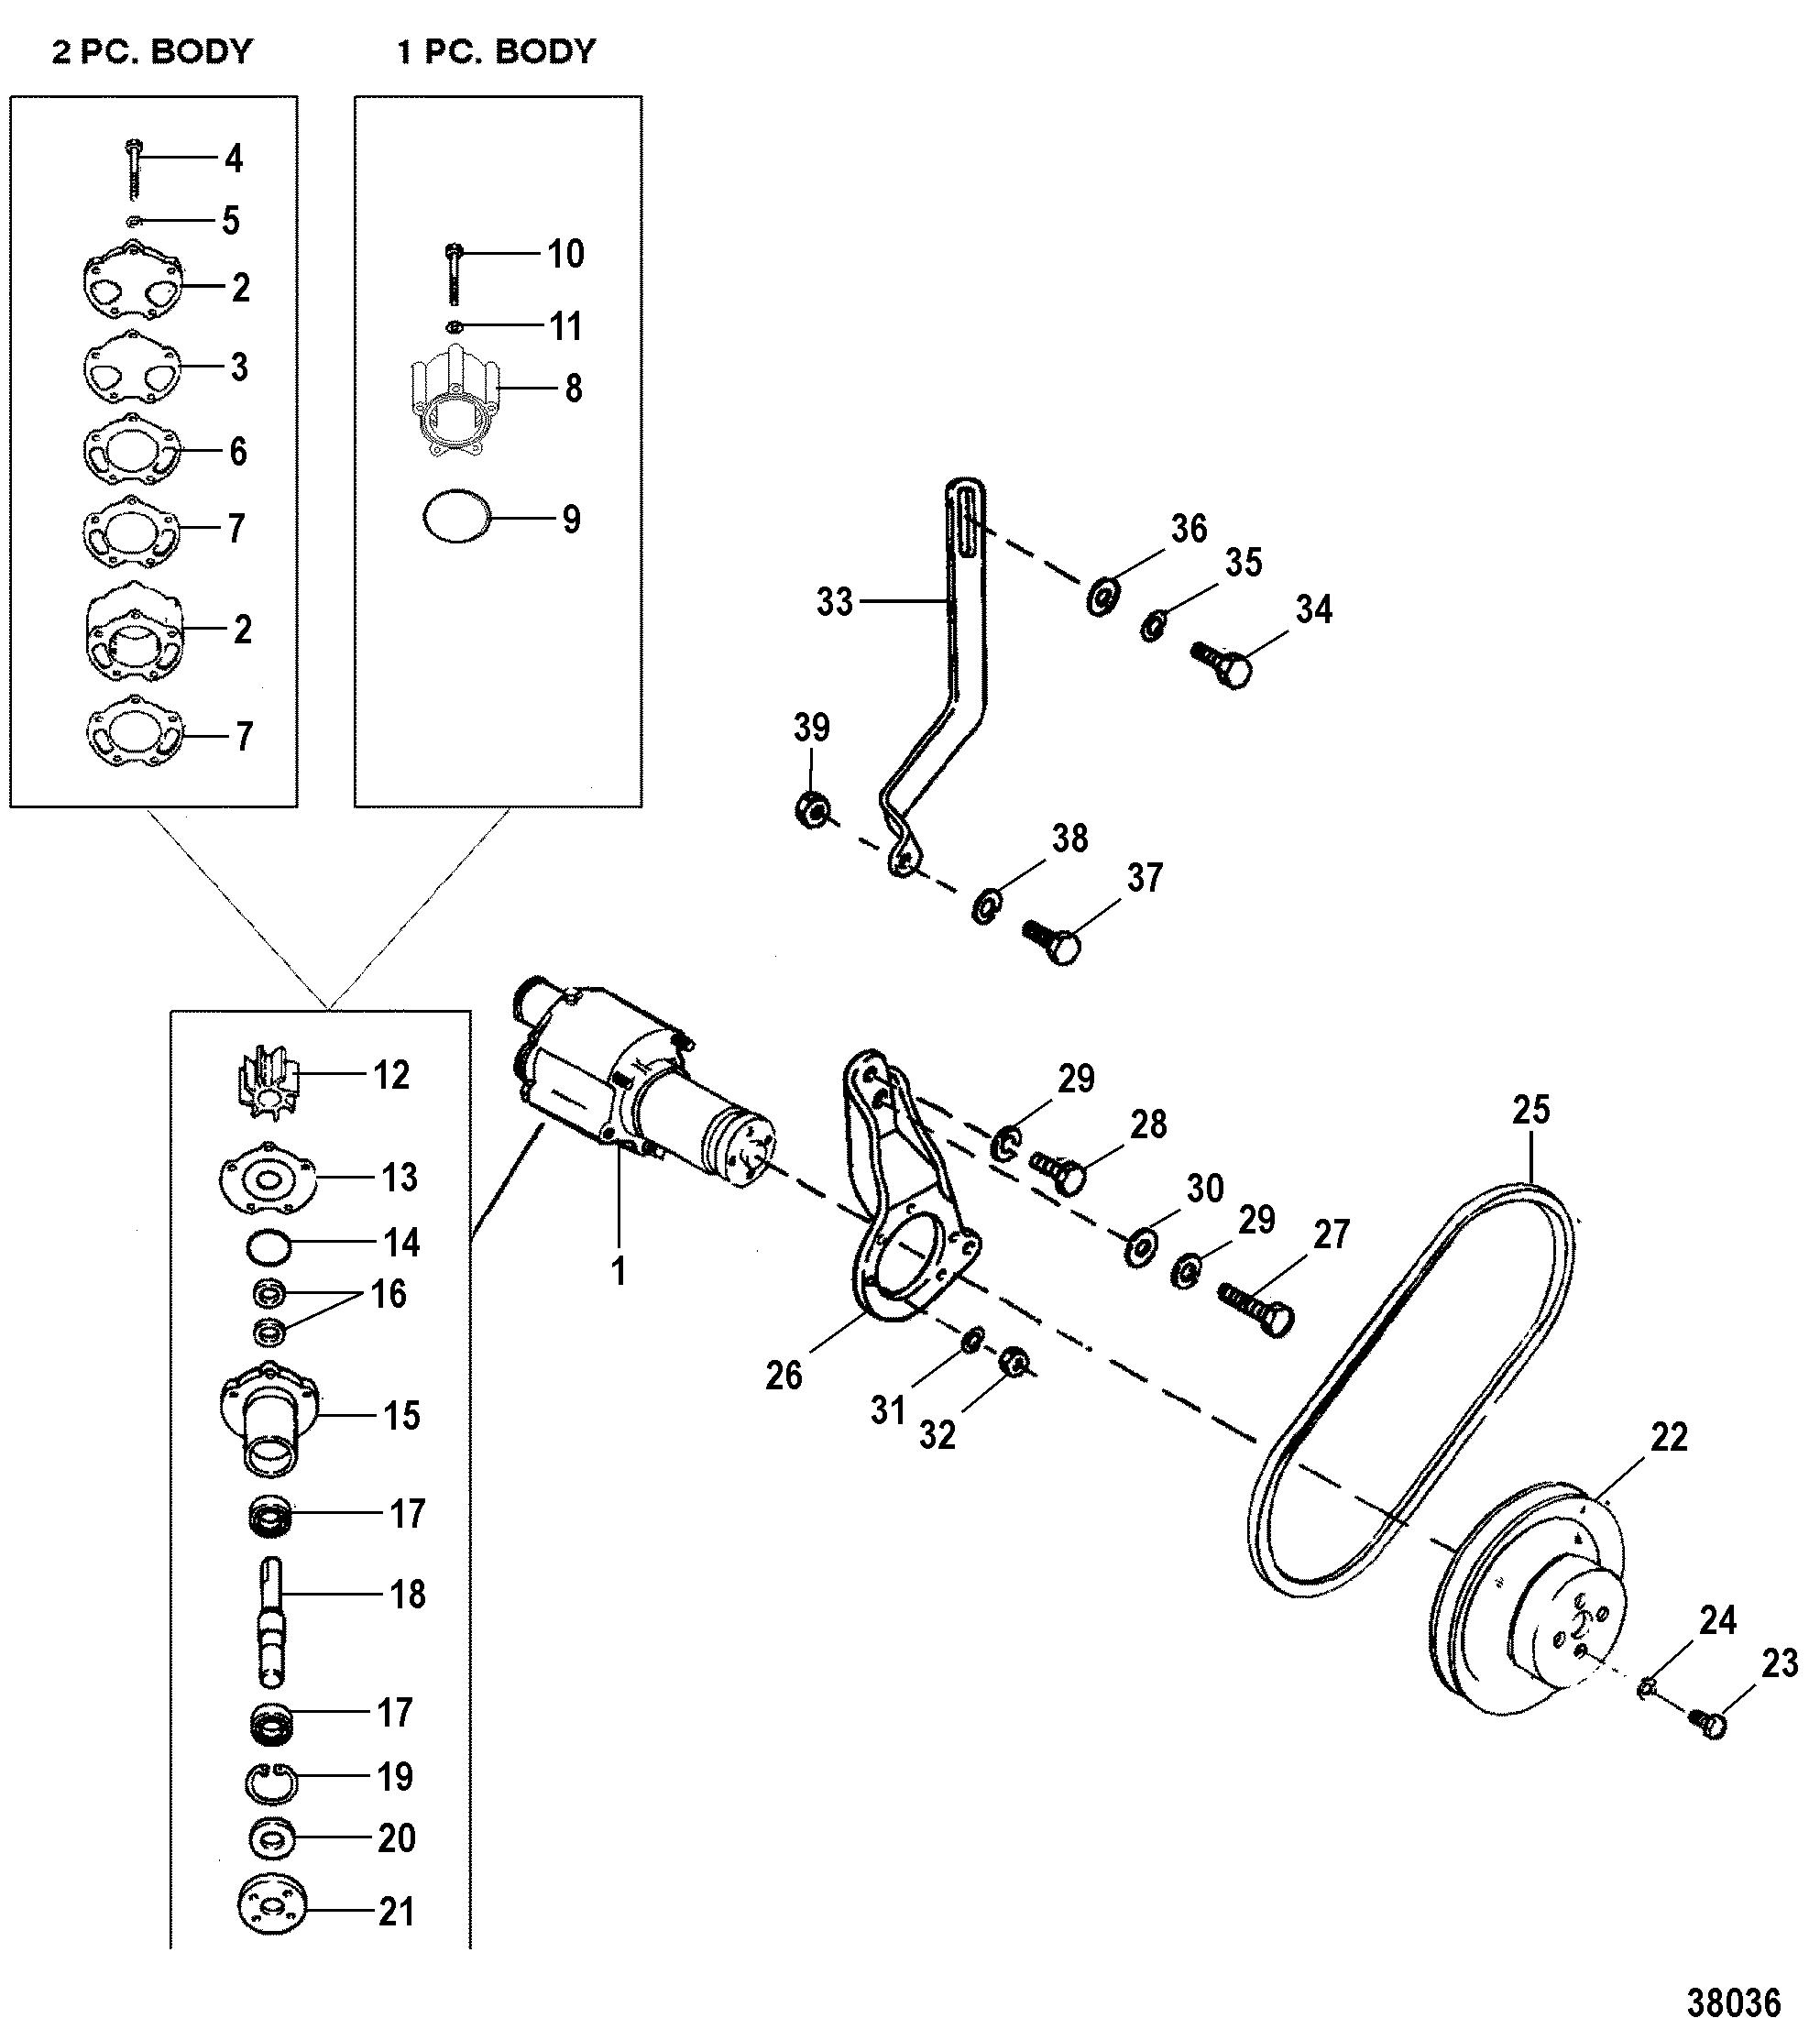 hight resolution of cp performance sea water pump 19961997 0f820000 thru 0k999999 wiring harness engine diagram